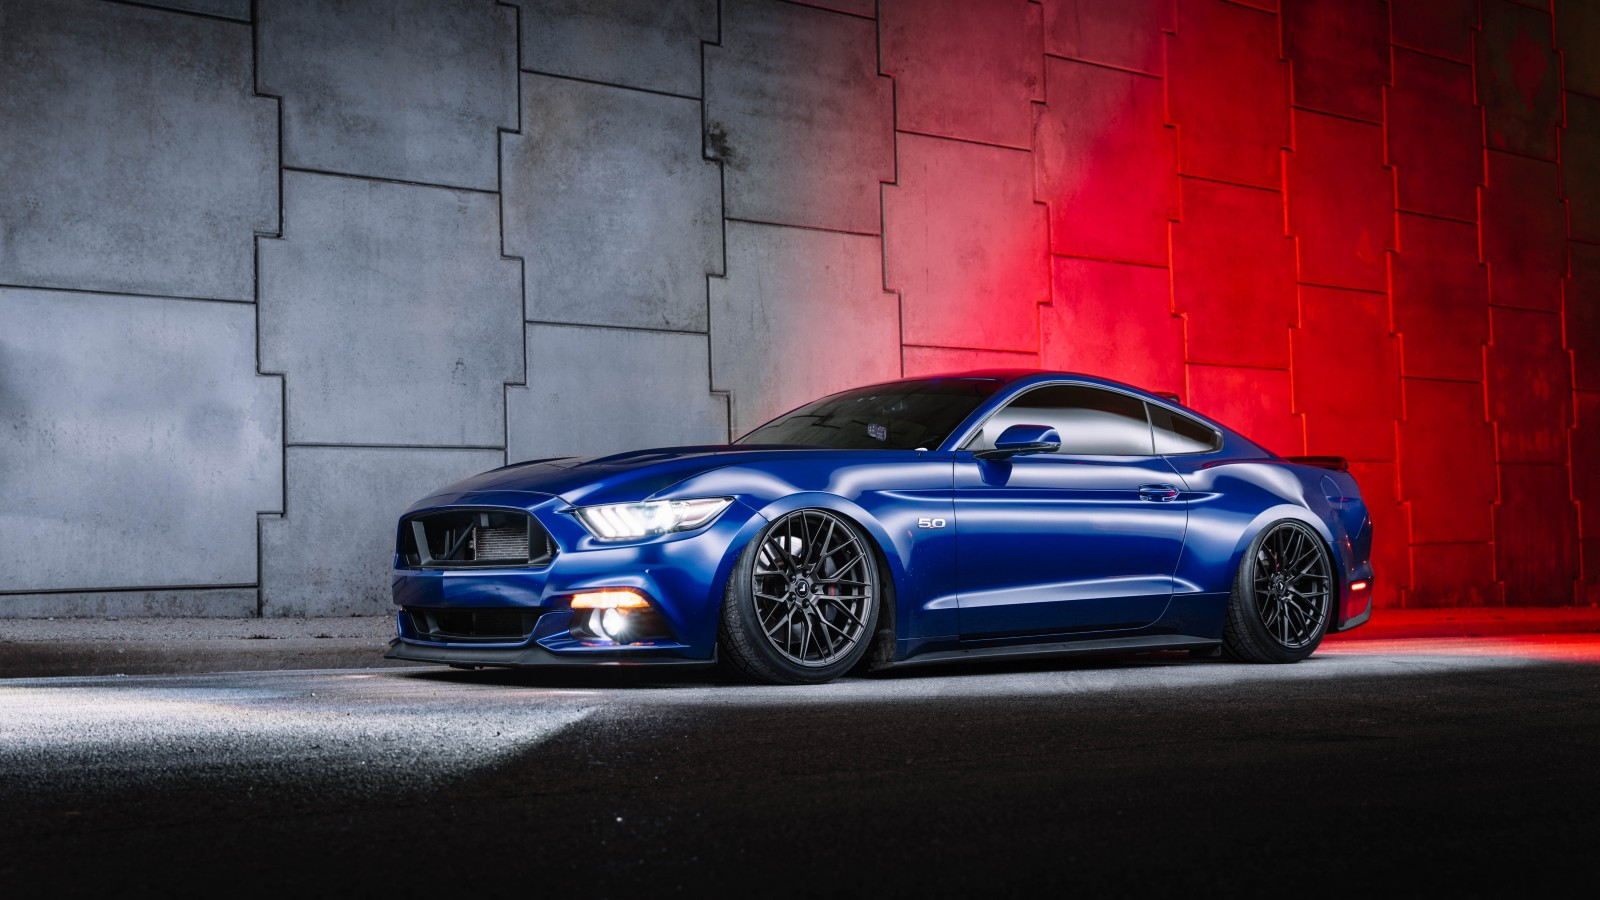 Ford Mustang GT Carbon Graphite 5K 2 Wallpaper | HD Car ...